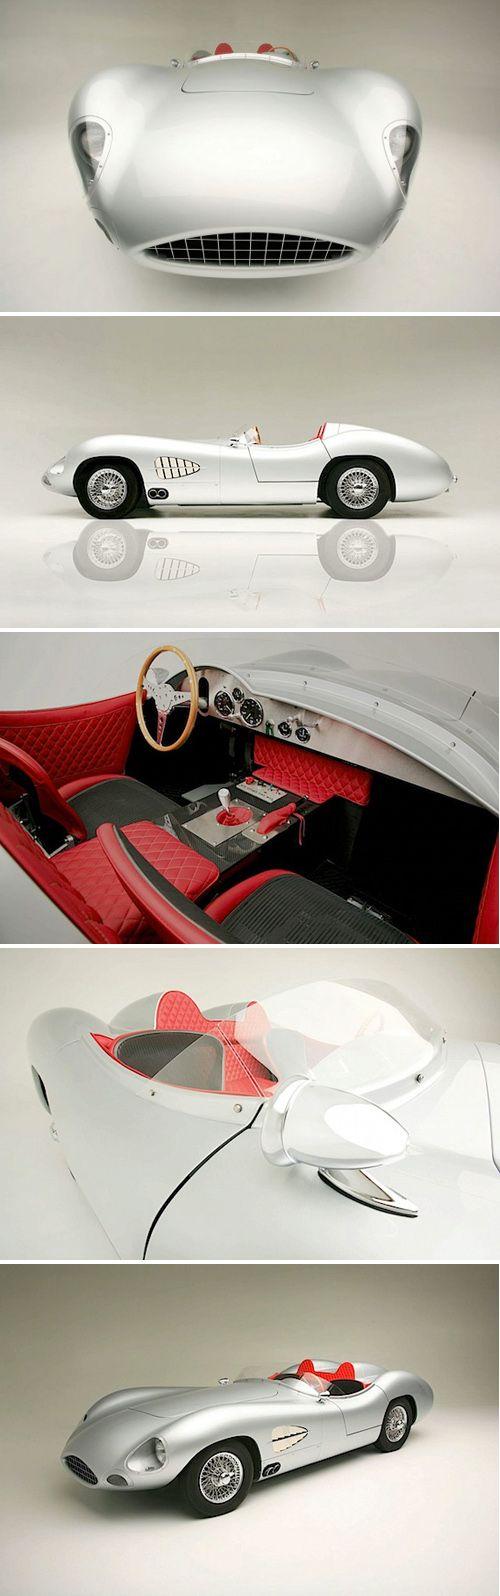 Honda car toys  Aston Martin   Dazing Curves  Cars Concepts u other